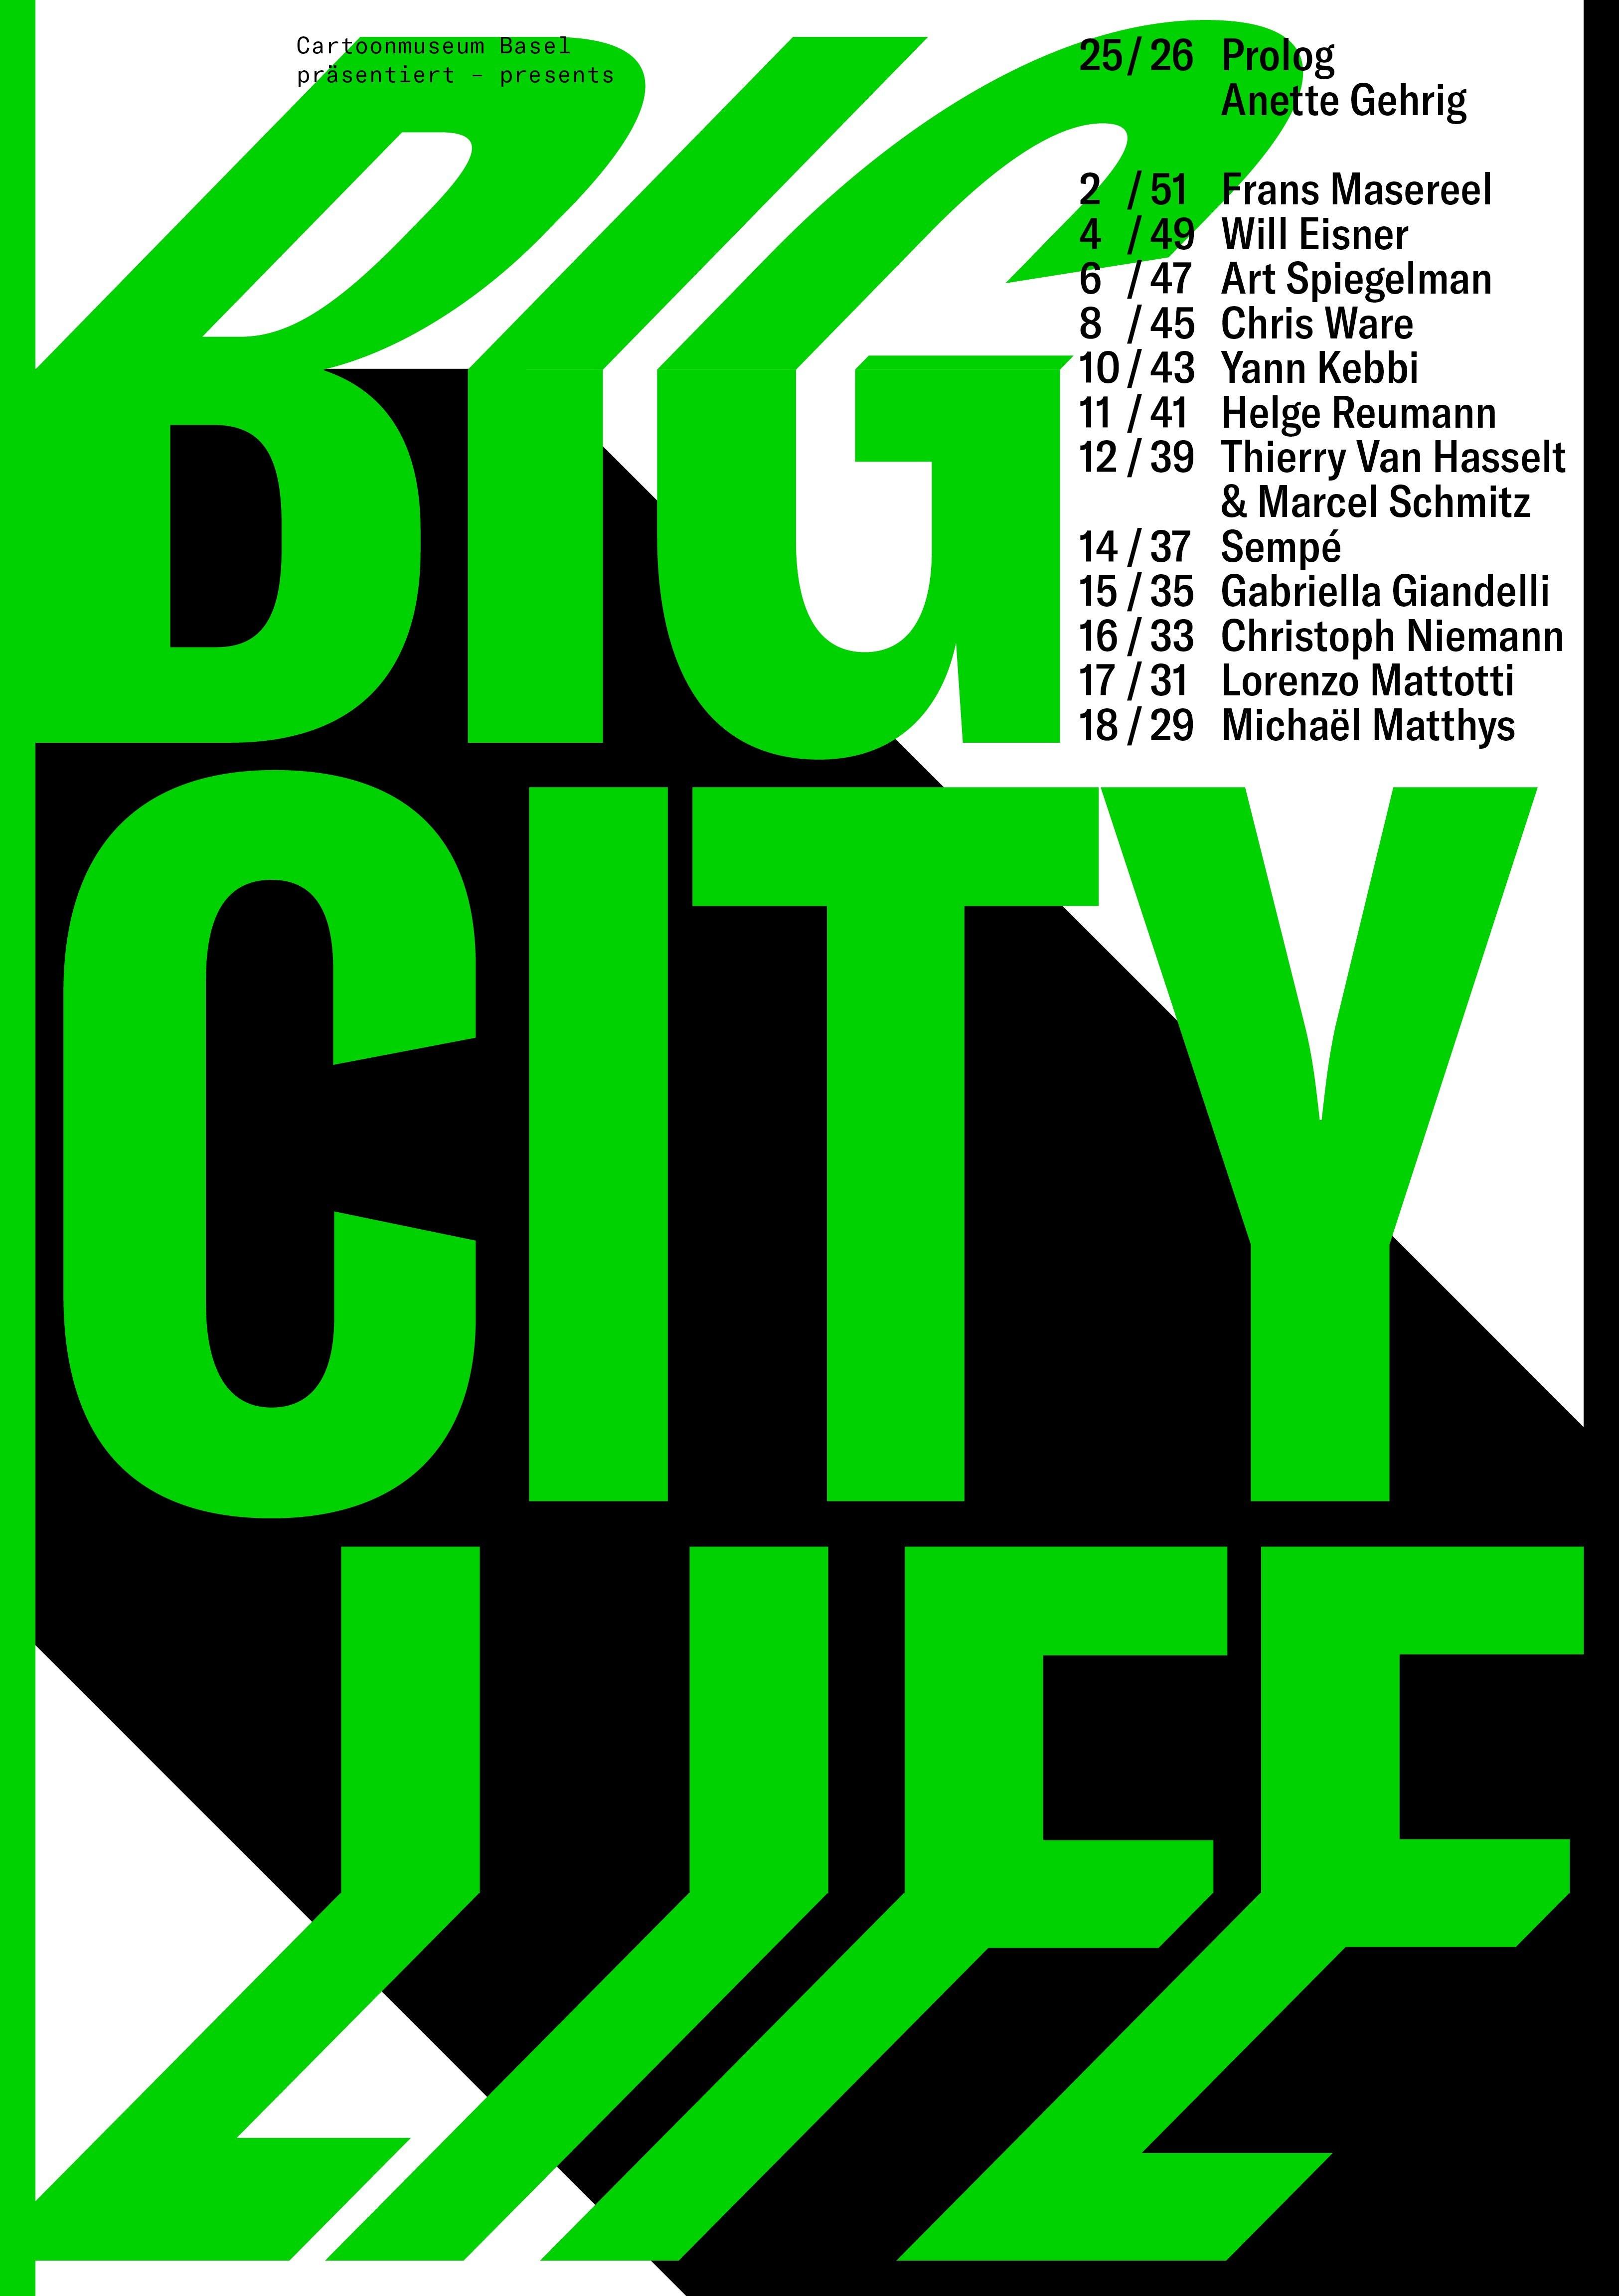 Bild 20210204 Cover Magazin Zur Ausstellung Big City Life Presse Amu